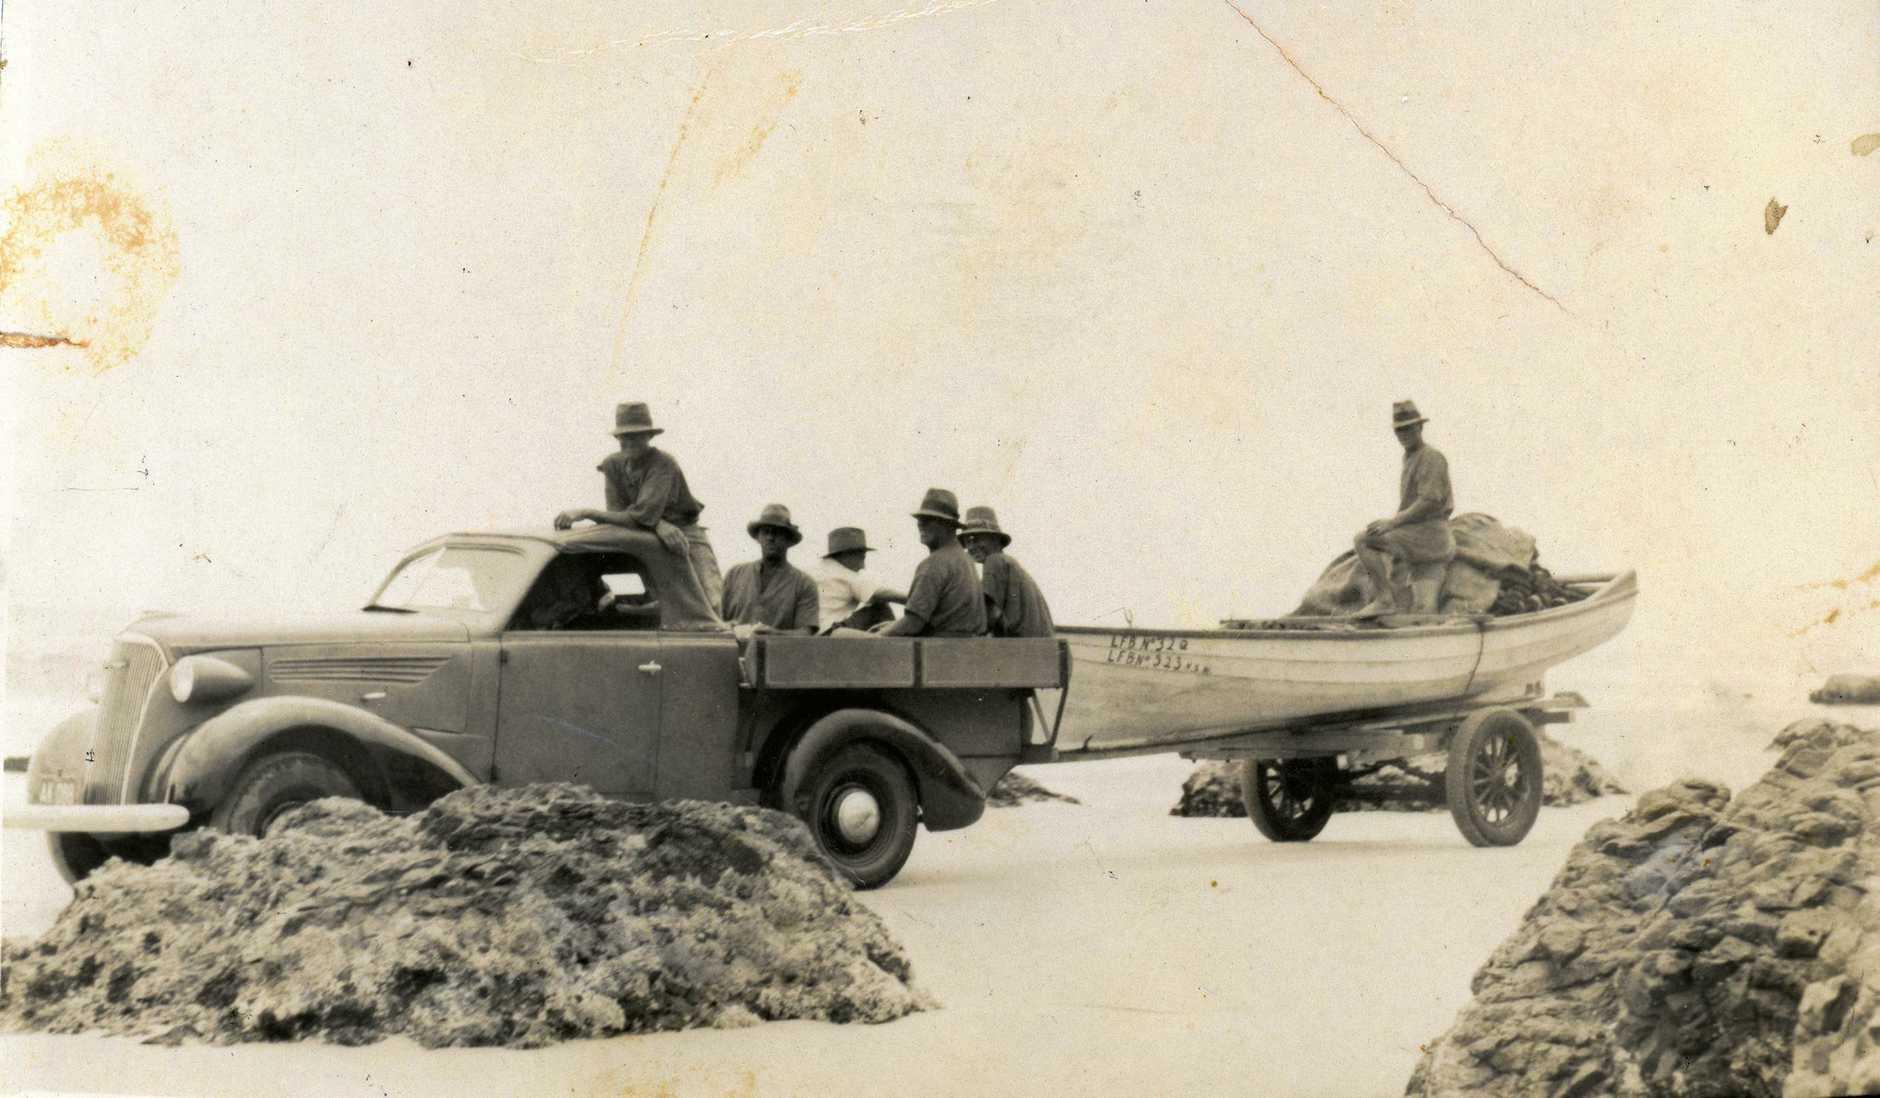 Boyd fishermen using the boat trailer, cira 1940s.